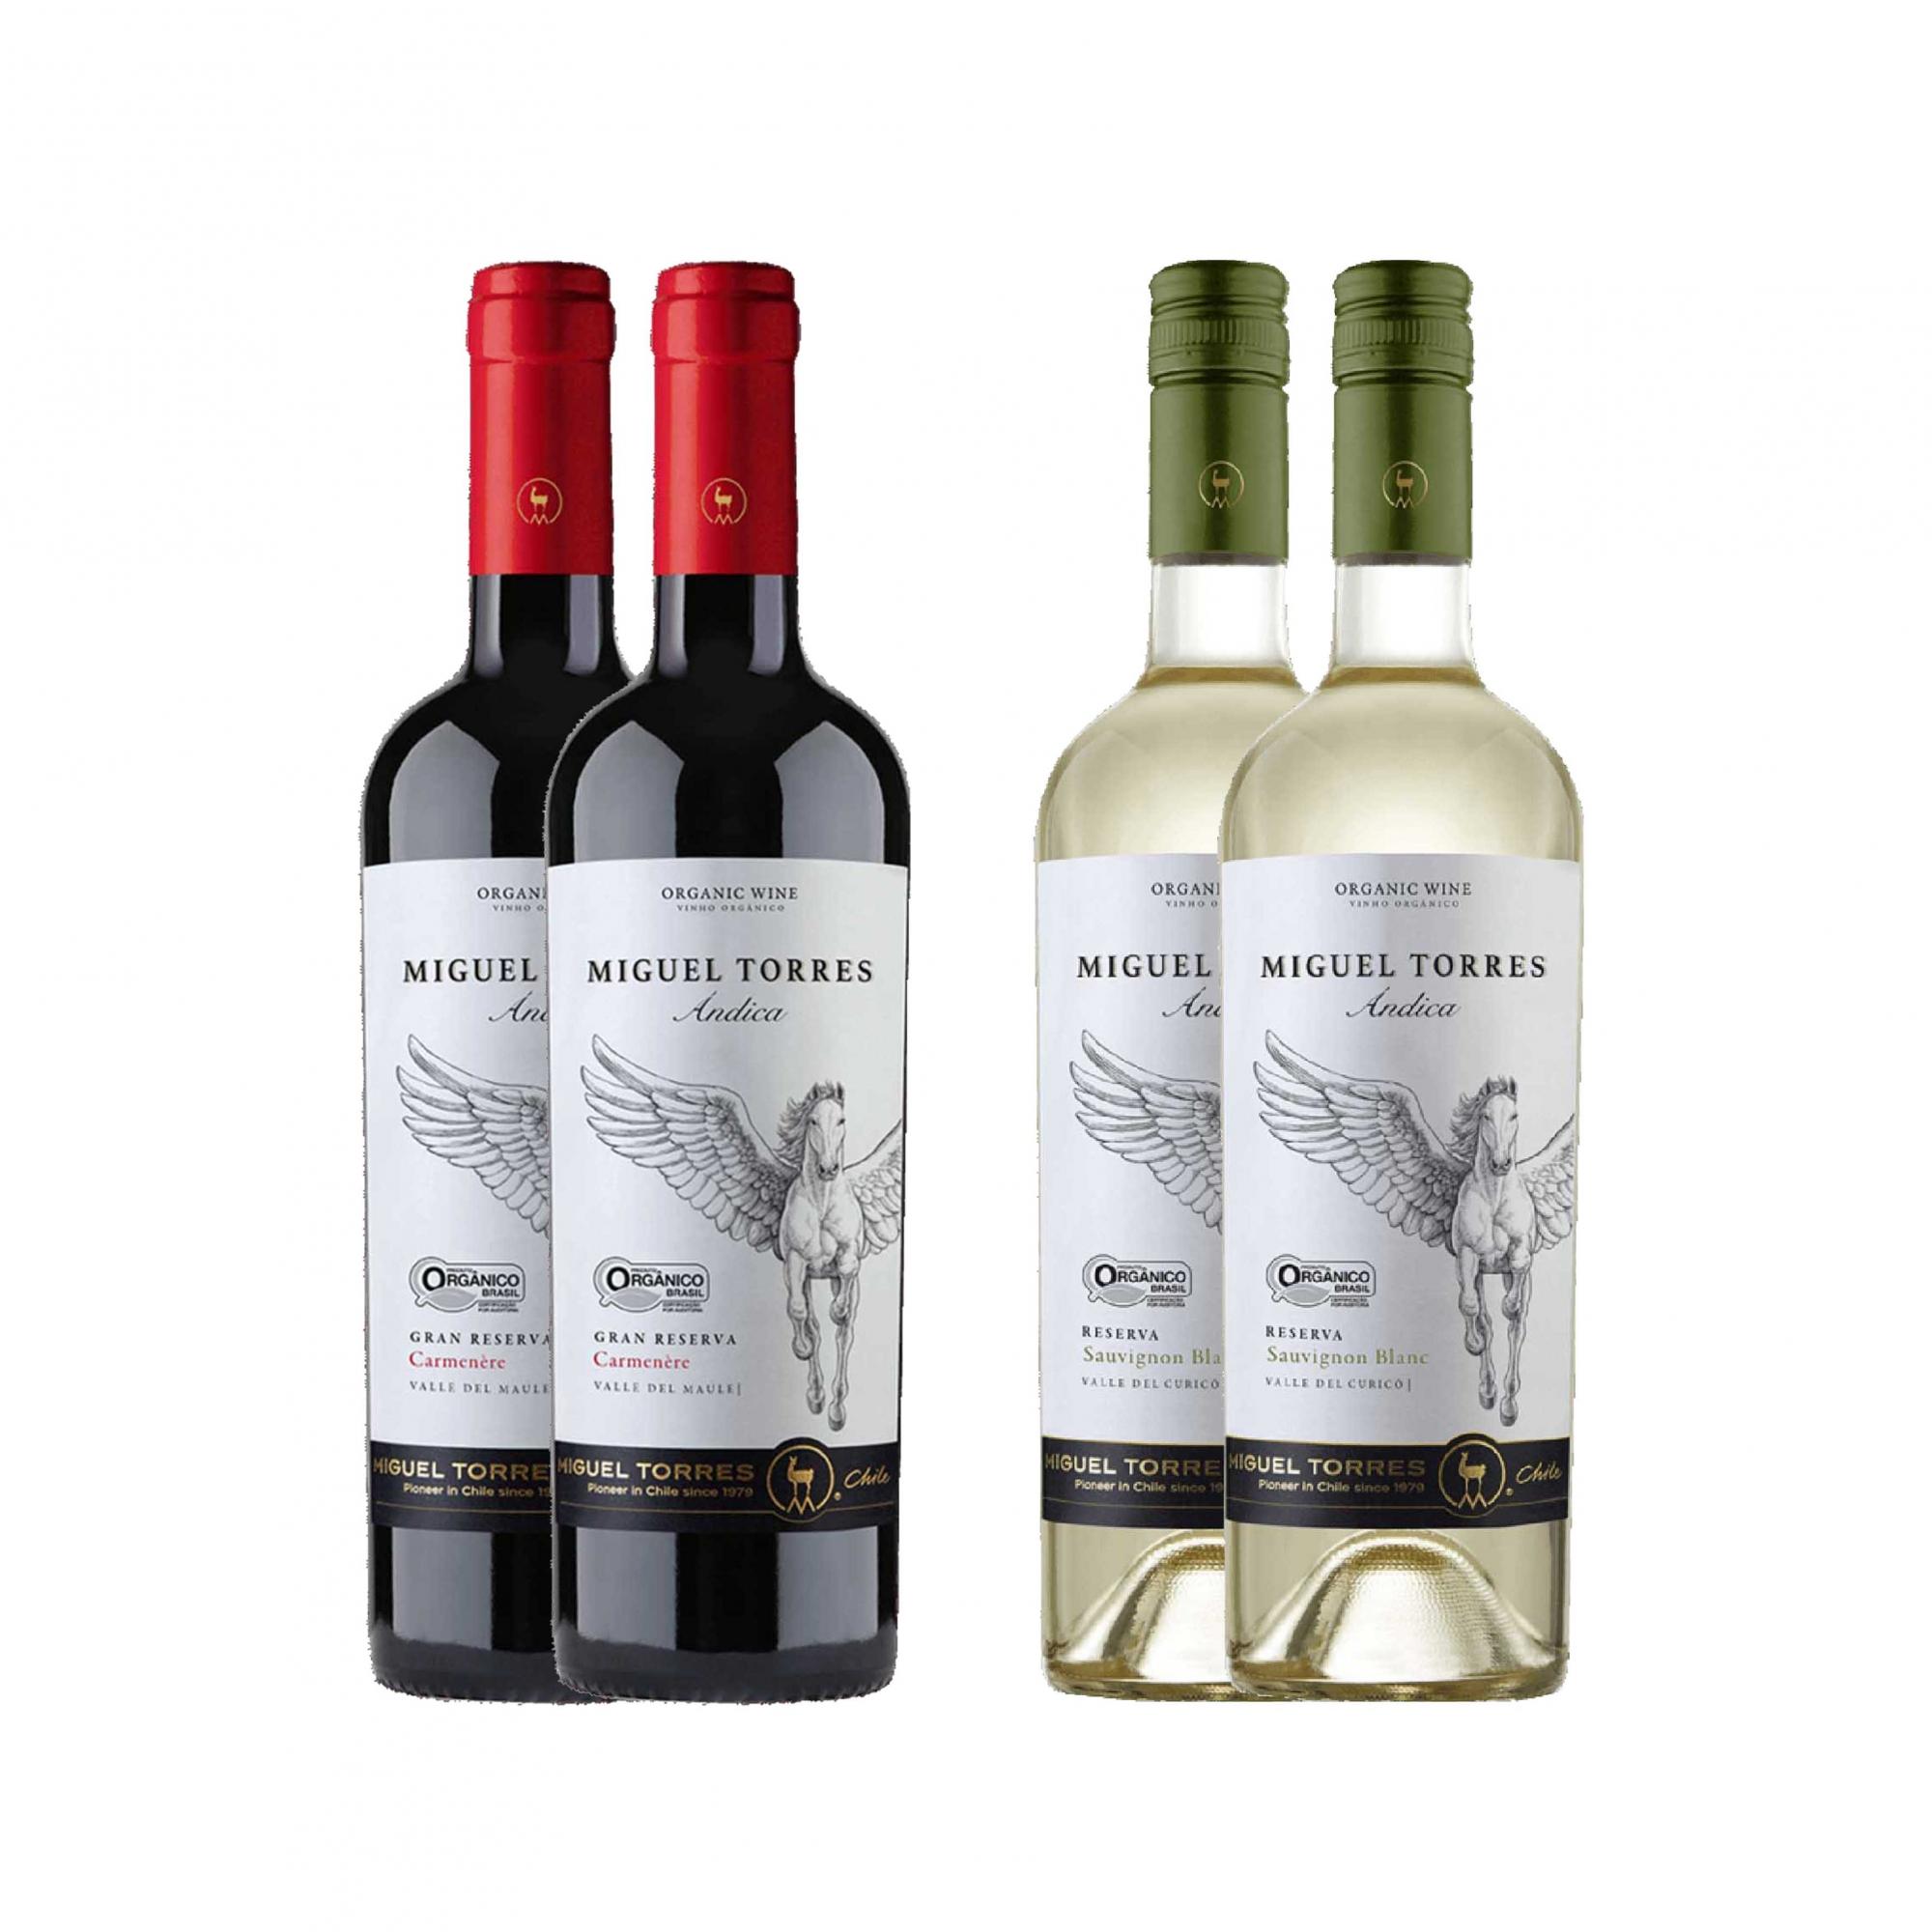 Kit 4x Vinho Tinto Chileno Orgânico Miguel Torres Carmenere e Sauvignon Blanc 2019